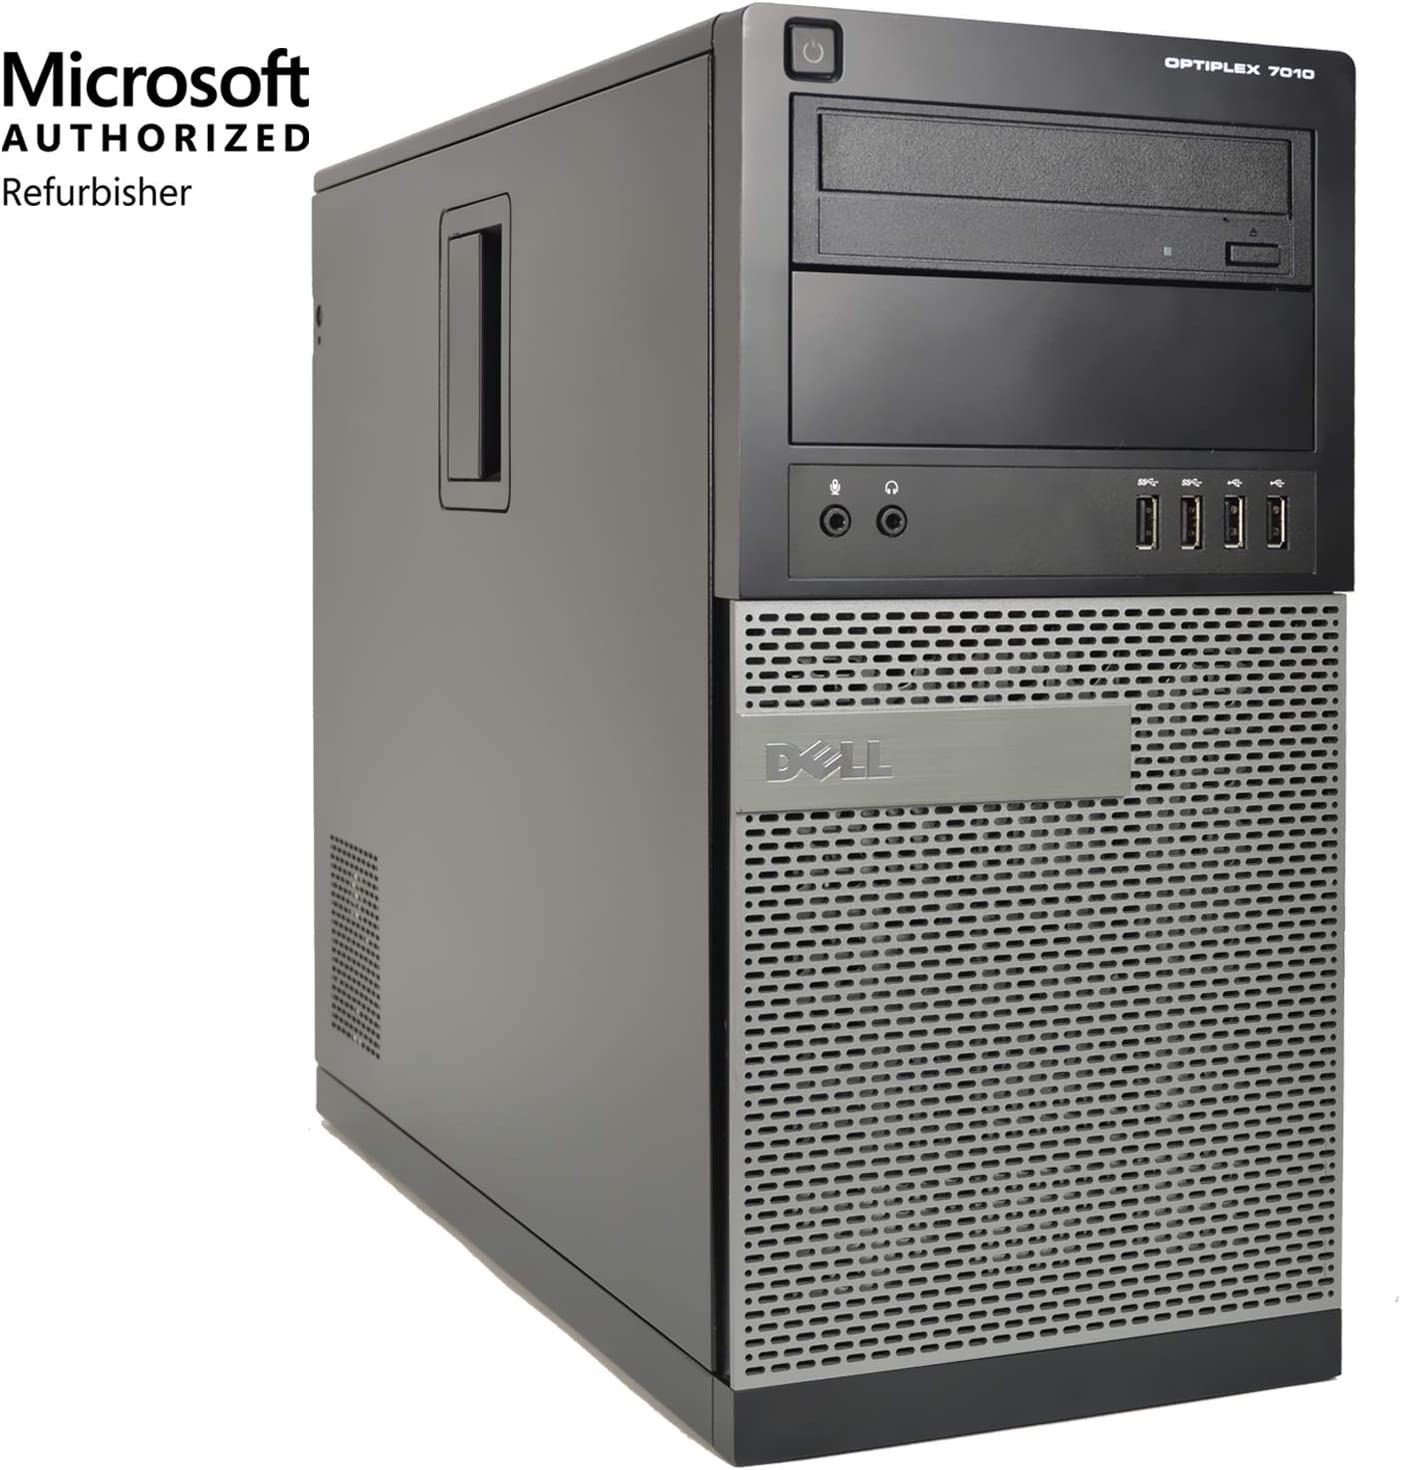 Dell XPS 8920 Desktop – Intel Core i7-7700 7th Generation Quad-Core up to 4.2 GHz, 32GB DDR4 Memory, 8TB SATA Hard Drive, 8GB Nvidia GeForce GTX 1070, DVD Burner, Windows 10 Pro